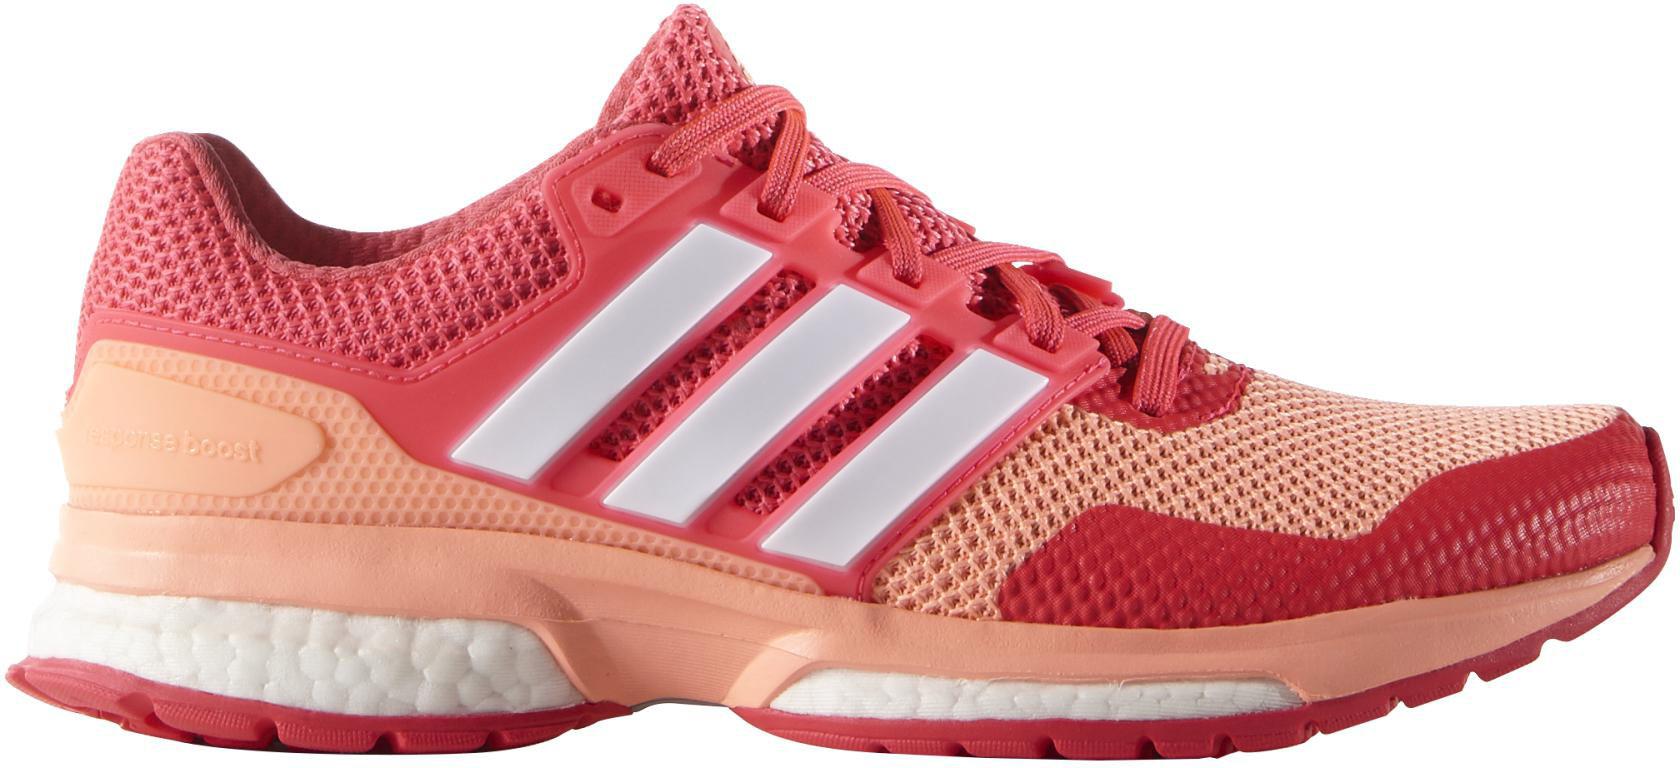 hot sale online 4017e 9f798 adidas RESPONSE BOOST 2 W